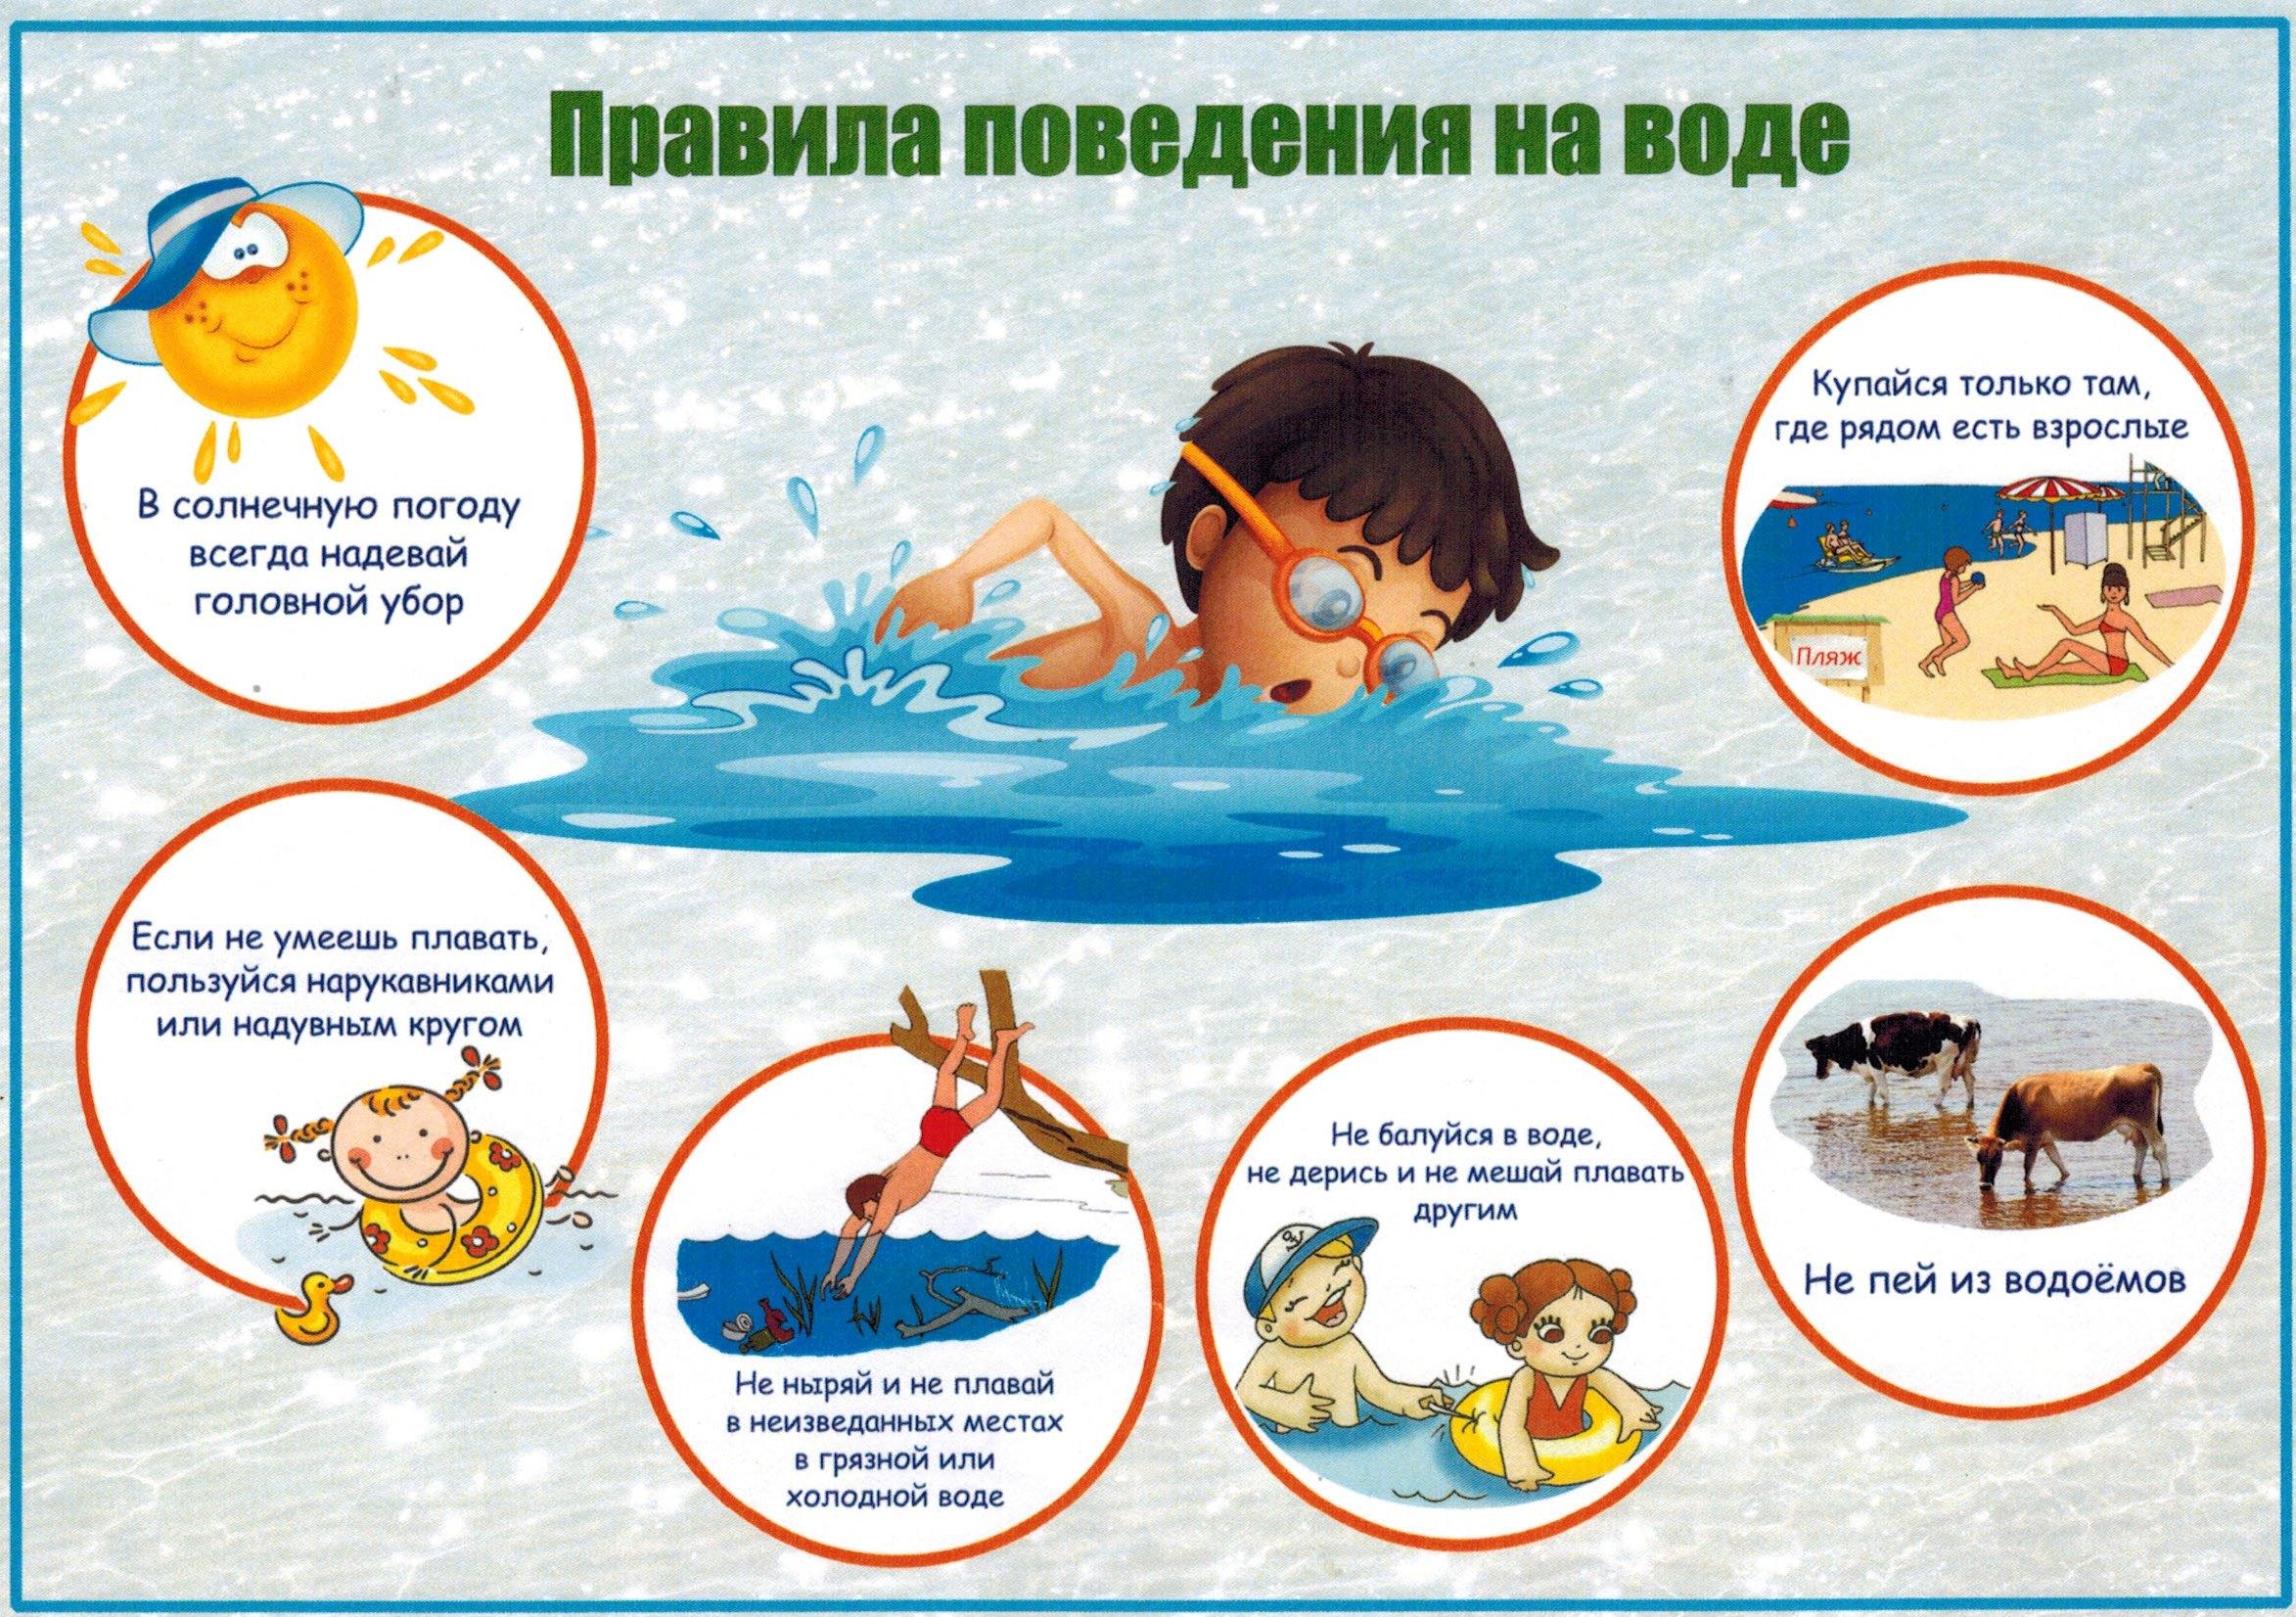 Новости Коломны   Правила поведения на воде Фото (Коломна)   iz zhizni kolomnyi